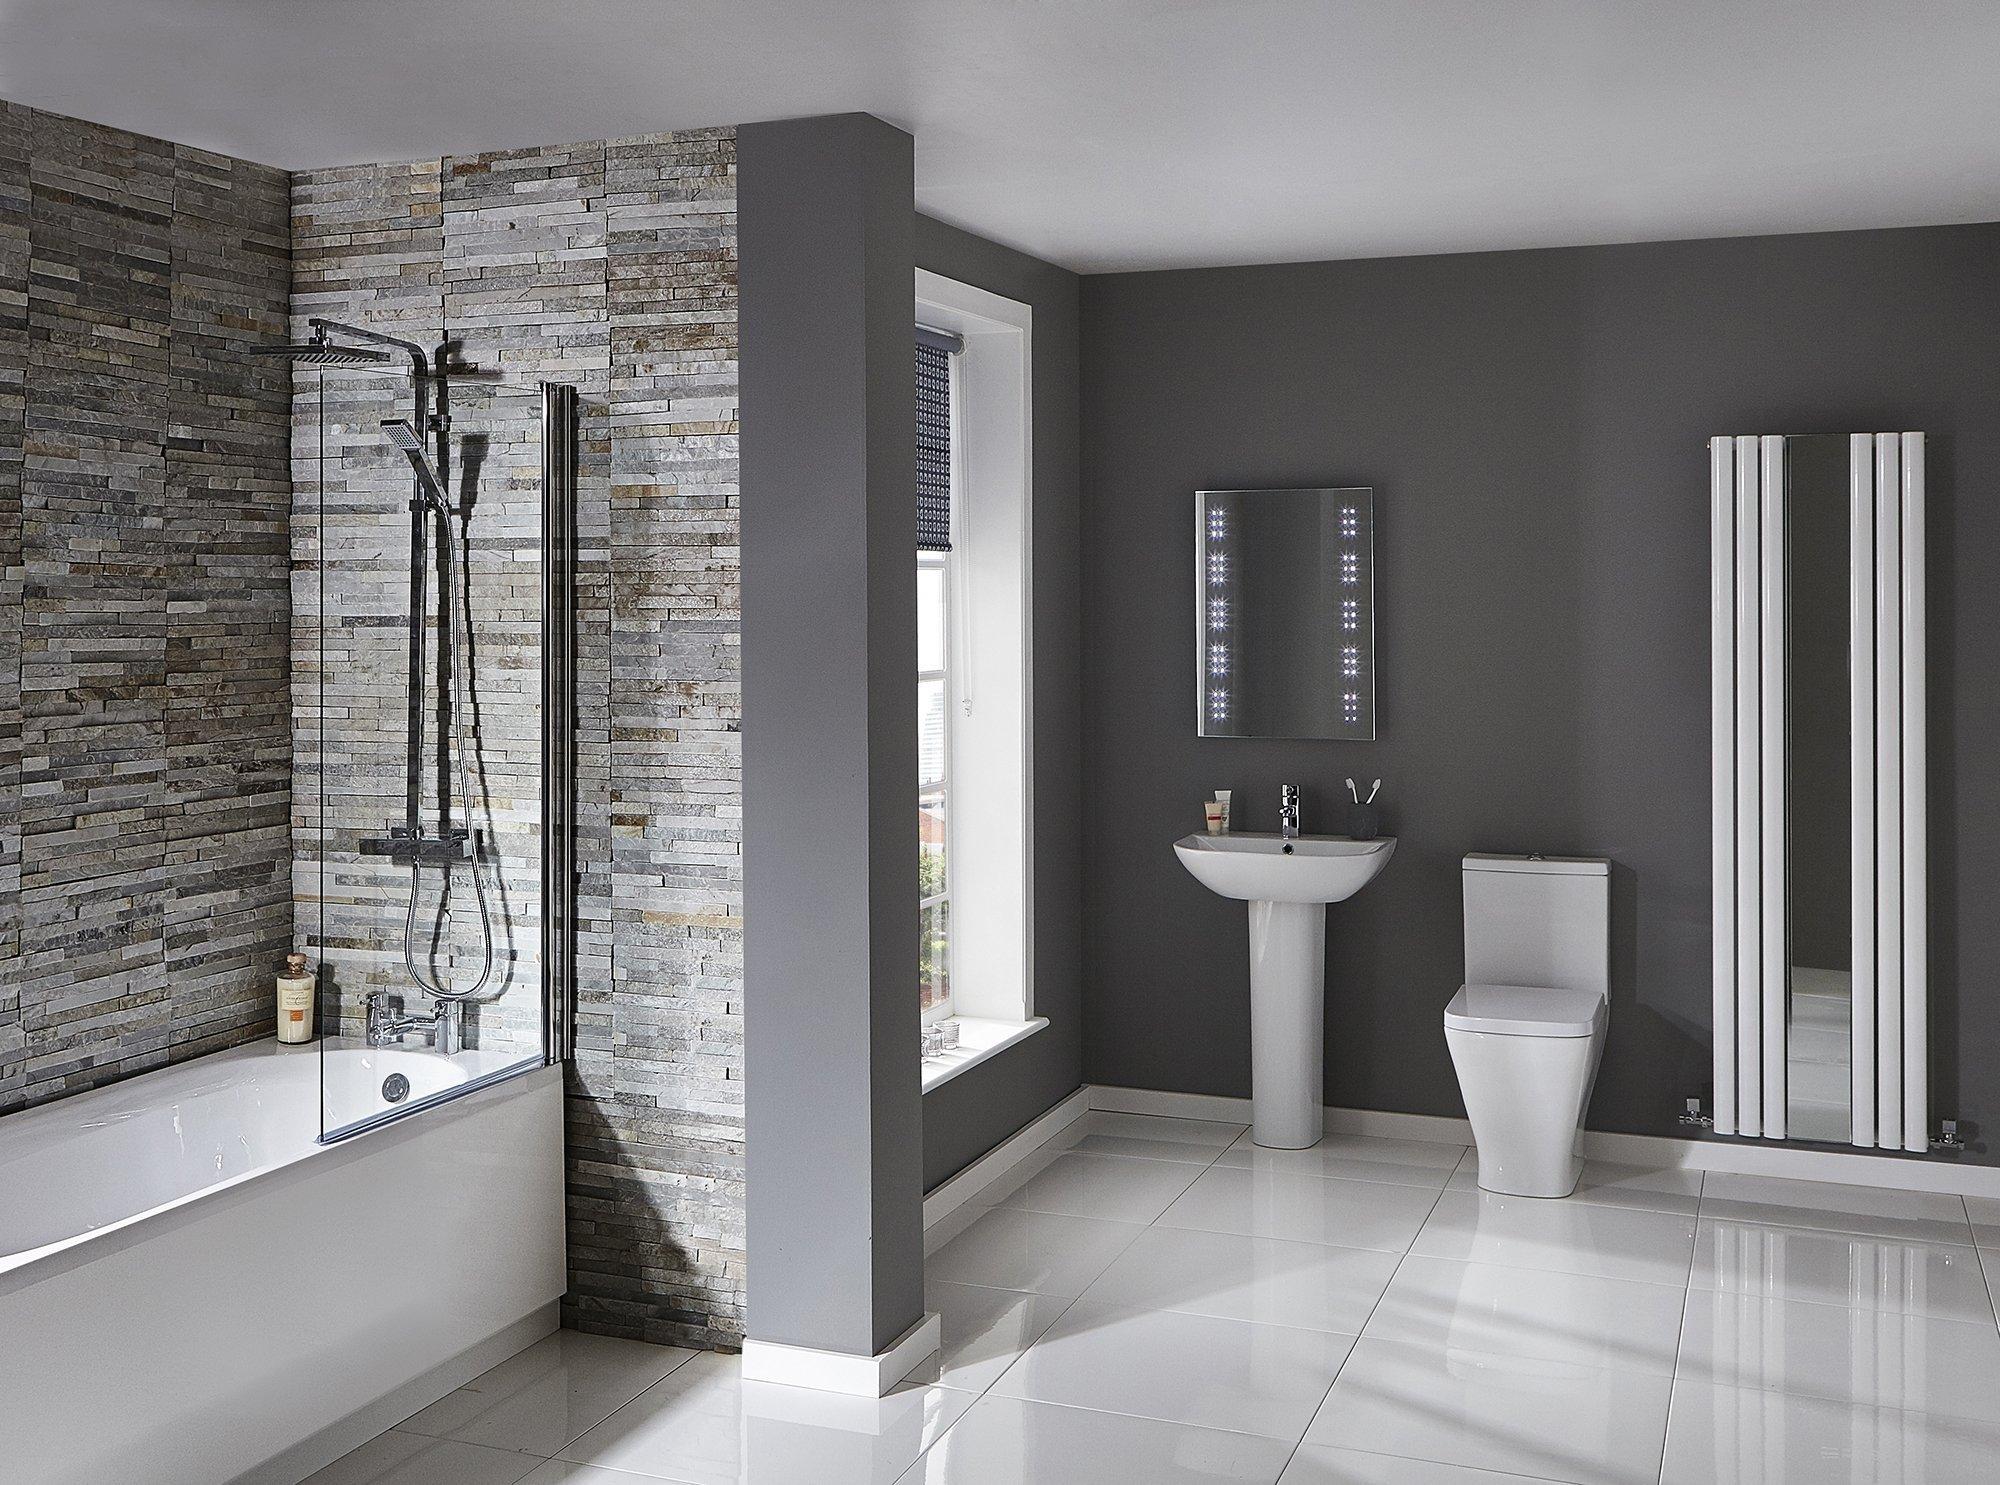 The Full Bathroom Solution | Bathroom Cladding Direct